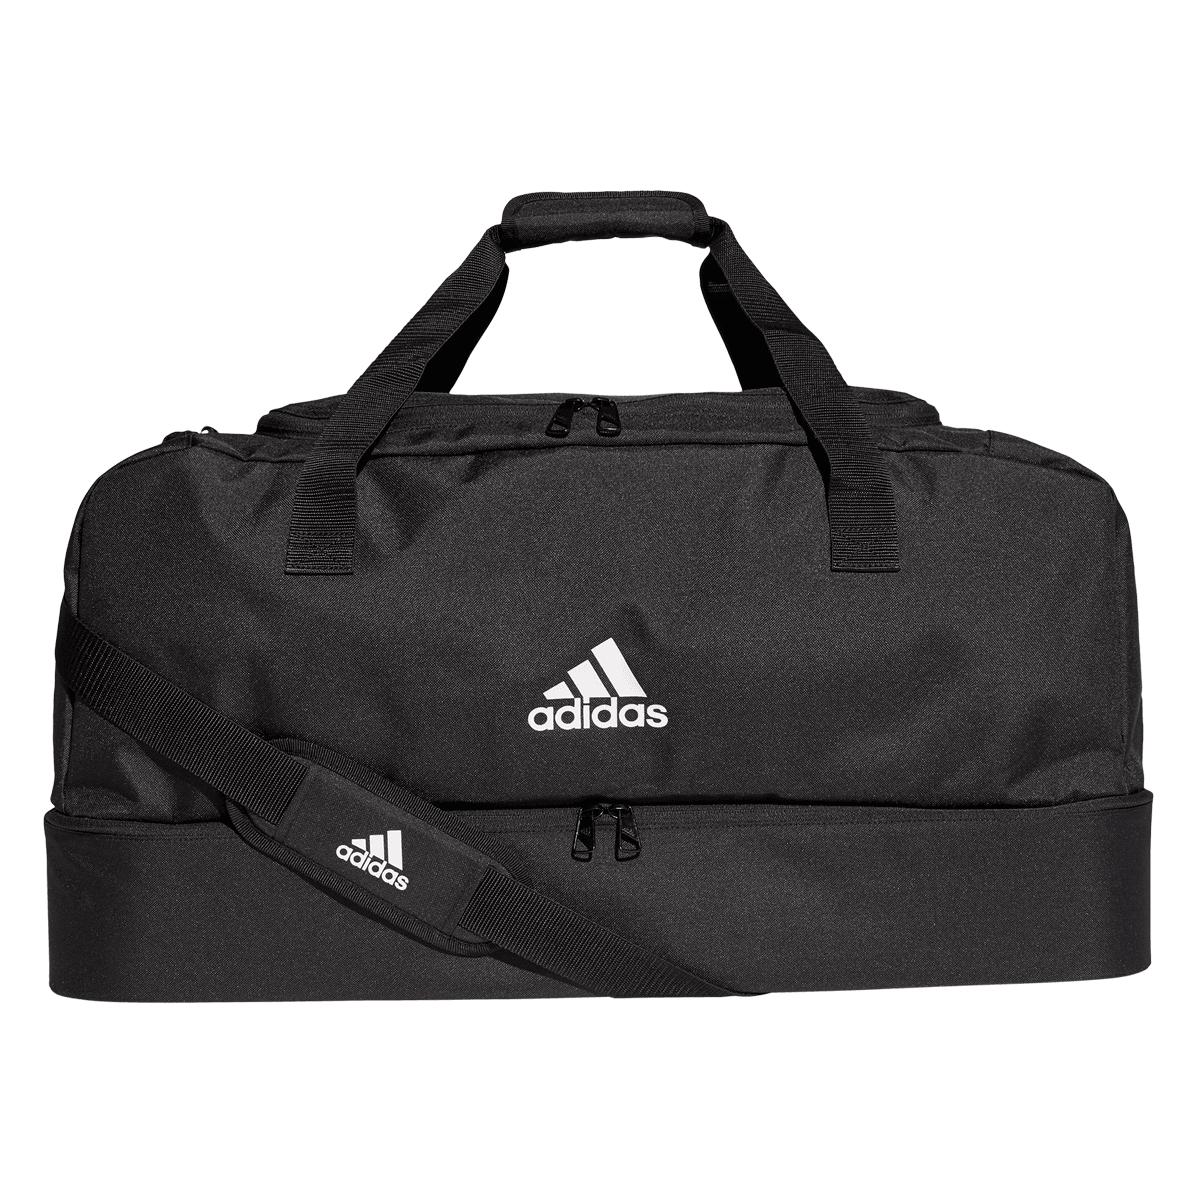 adidas Tiro Duffelbag Bottom Compartment sporttáska L feketefehér